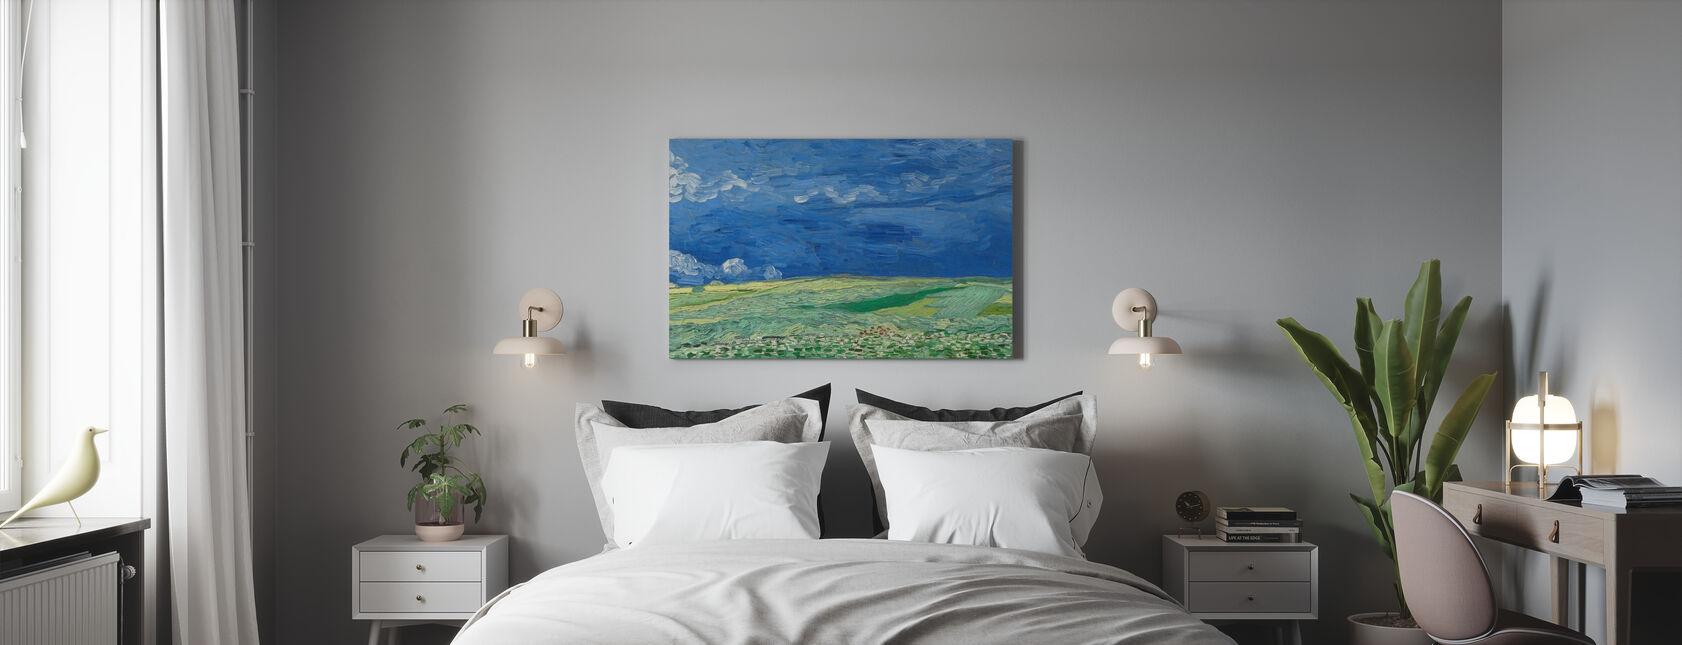 Wheatfield - Vincent Van Gogh - Canvas print - Bedroom